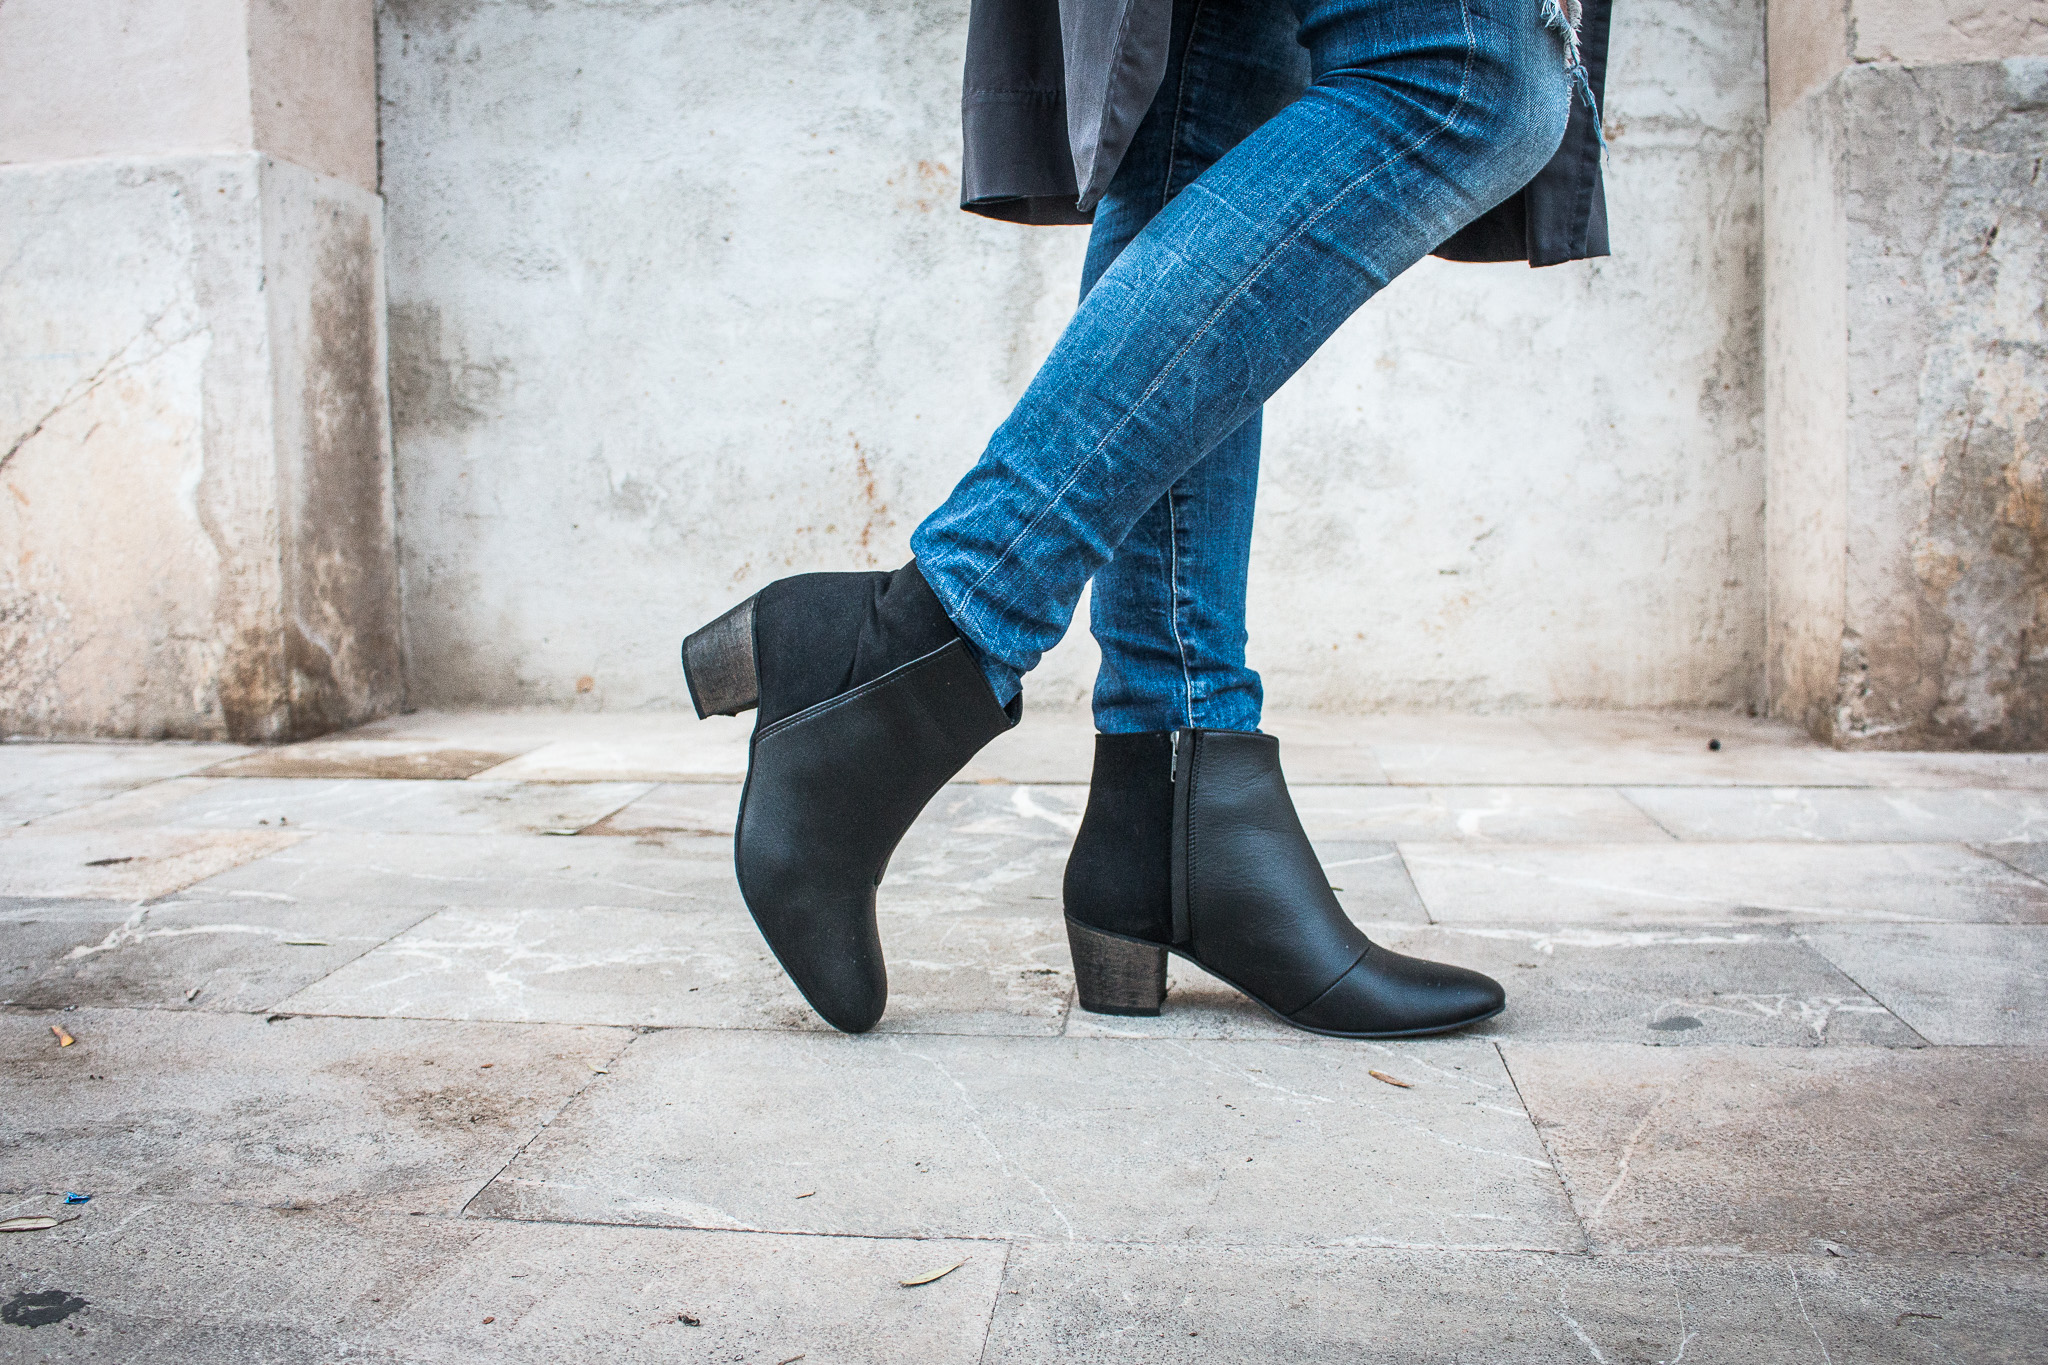 1517-vegan-shoes-bag-nov-2016-8